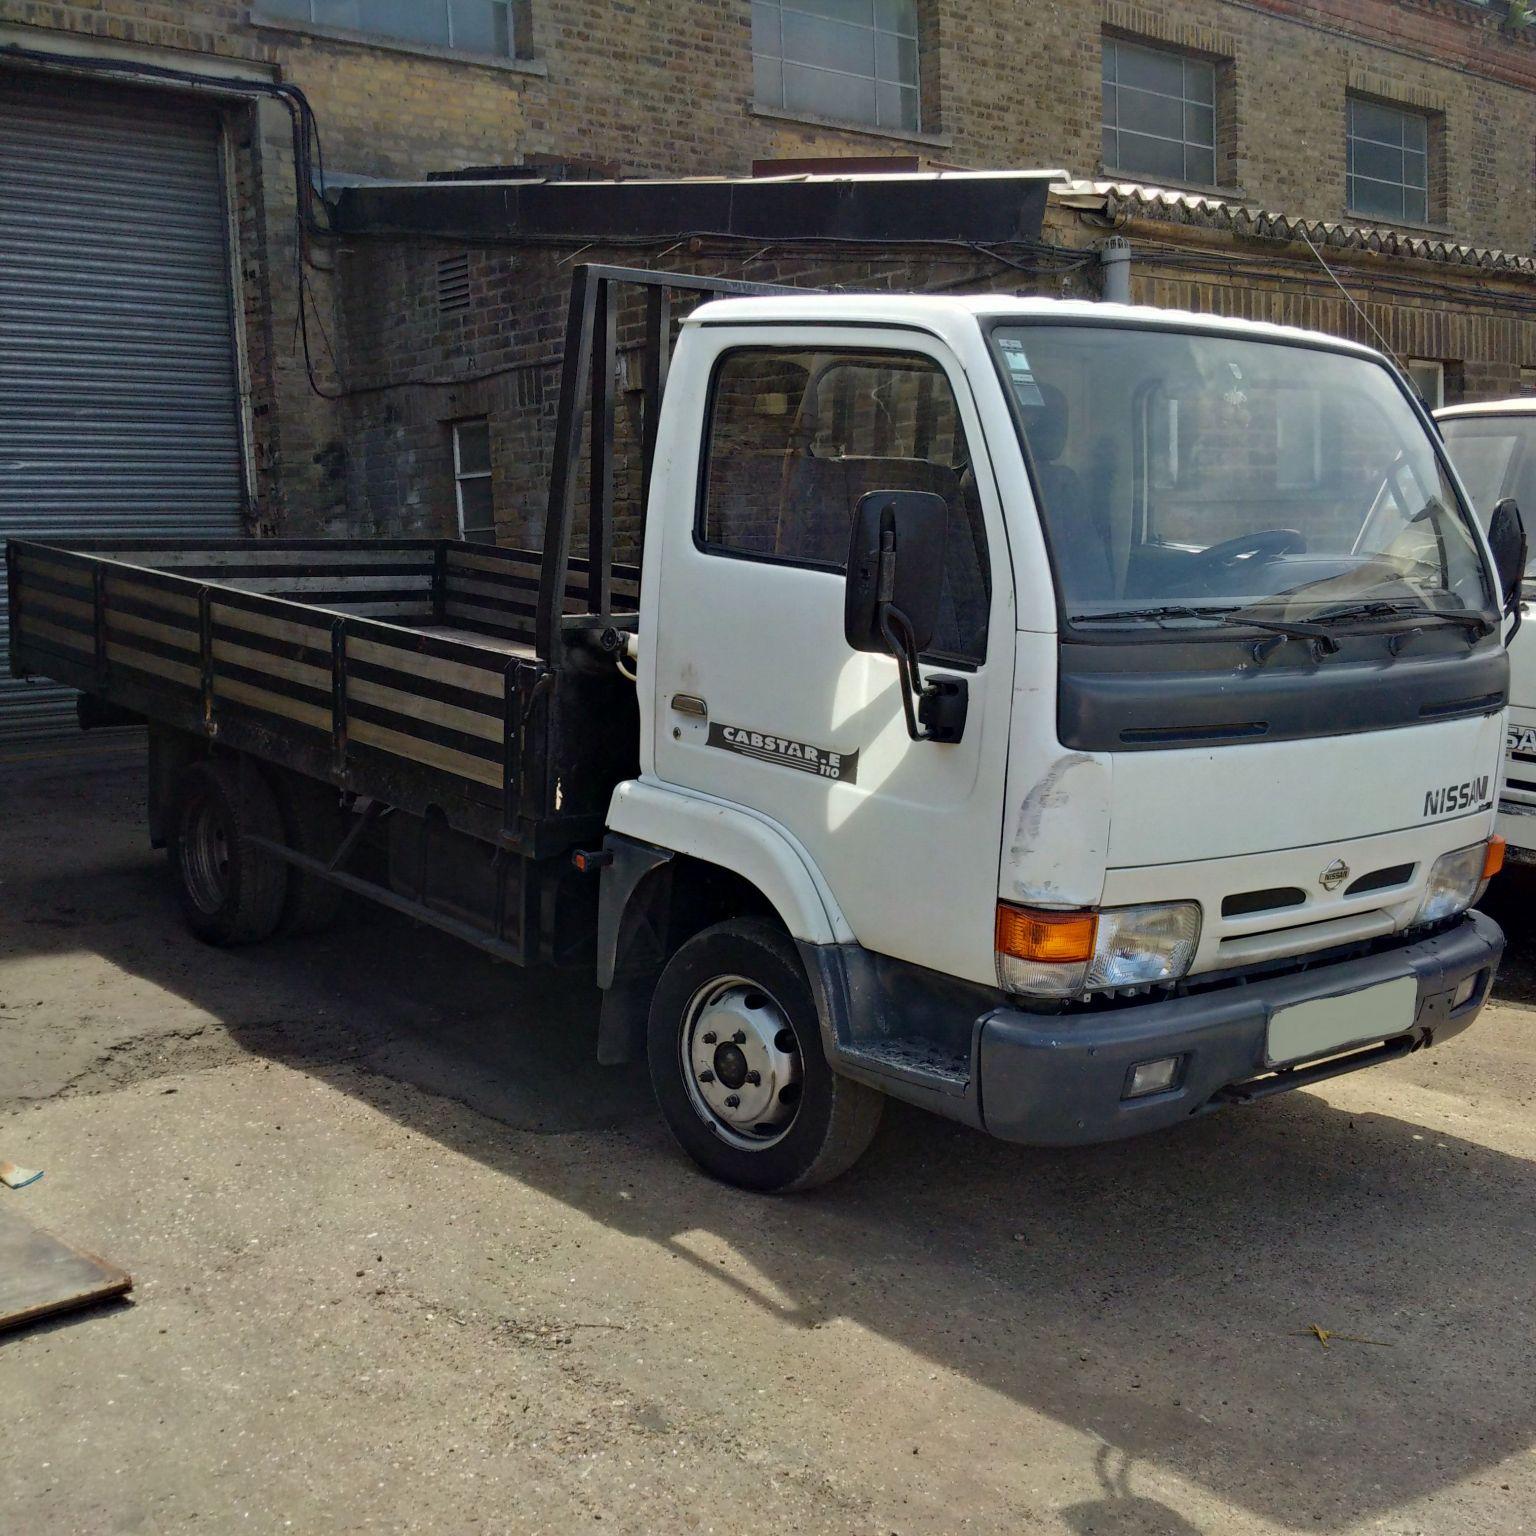 Left hand drive Nissan Cabstar E110 6 tyres truck.